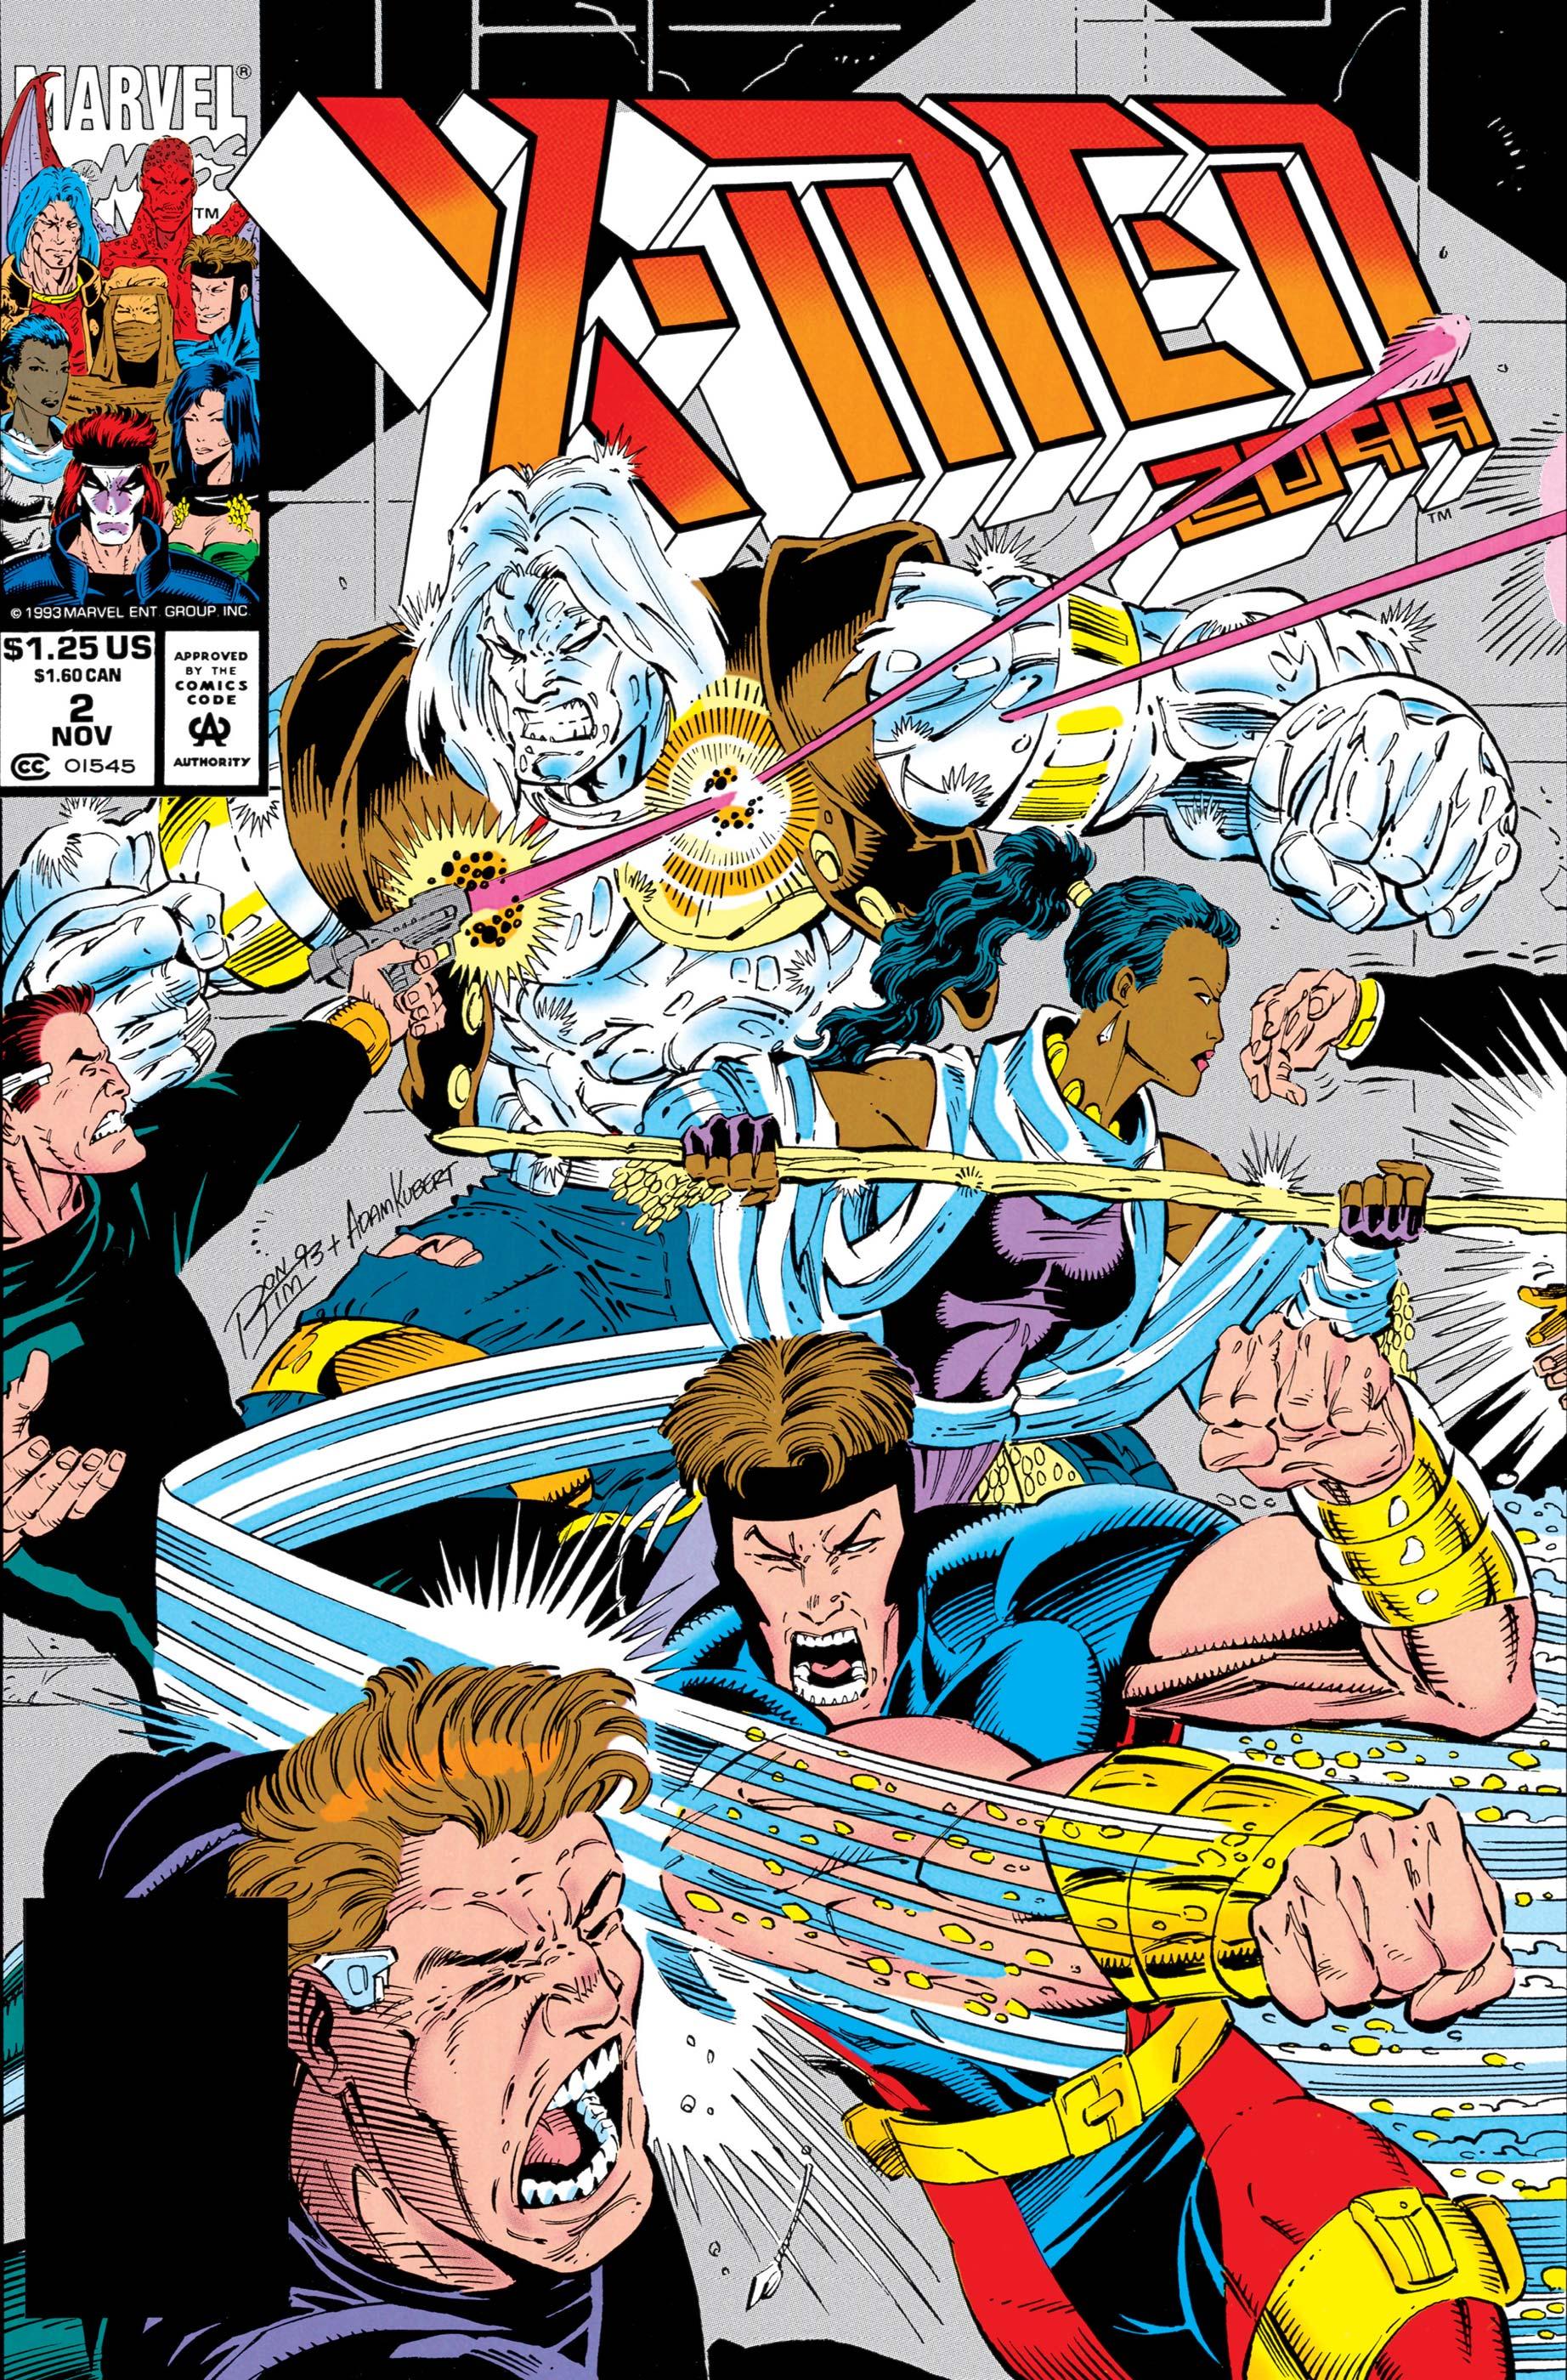 X-Men 2099 (1993) #2